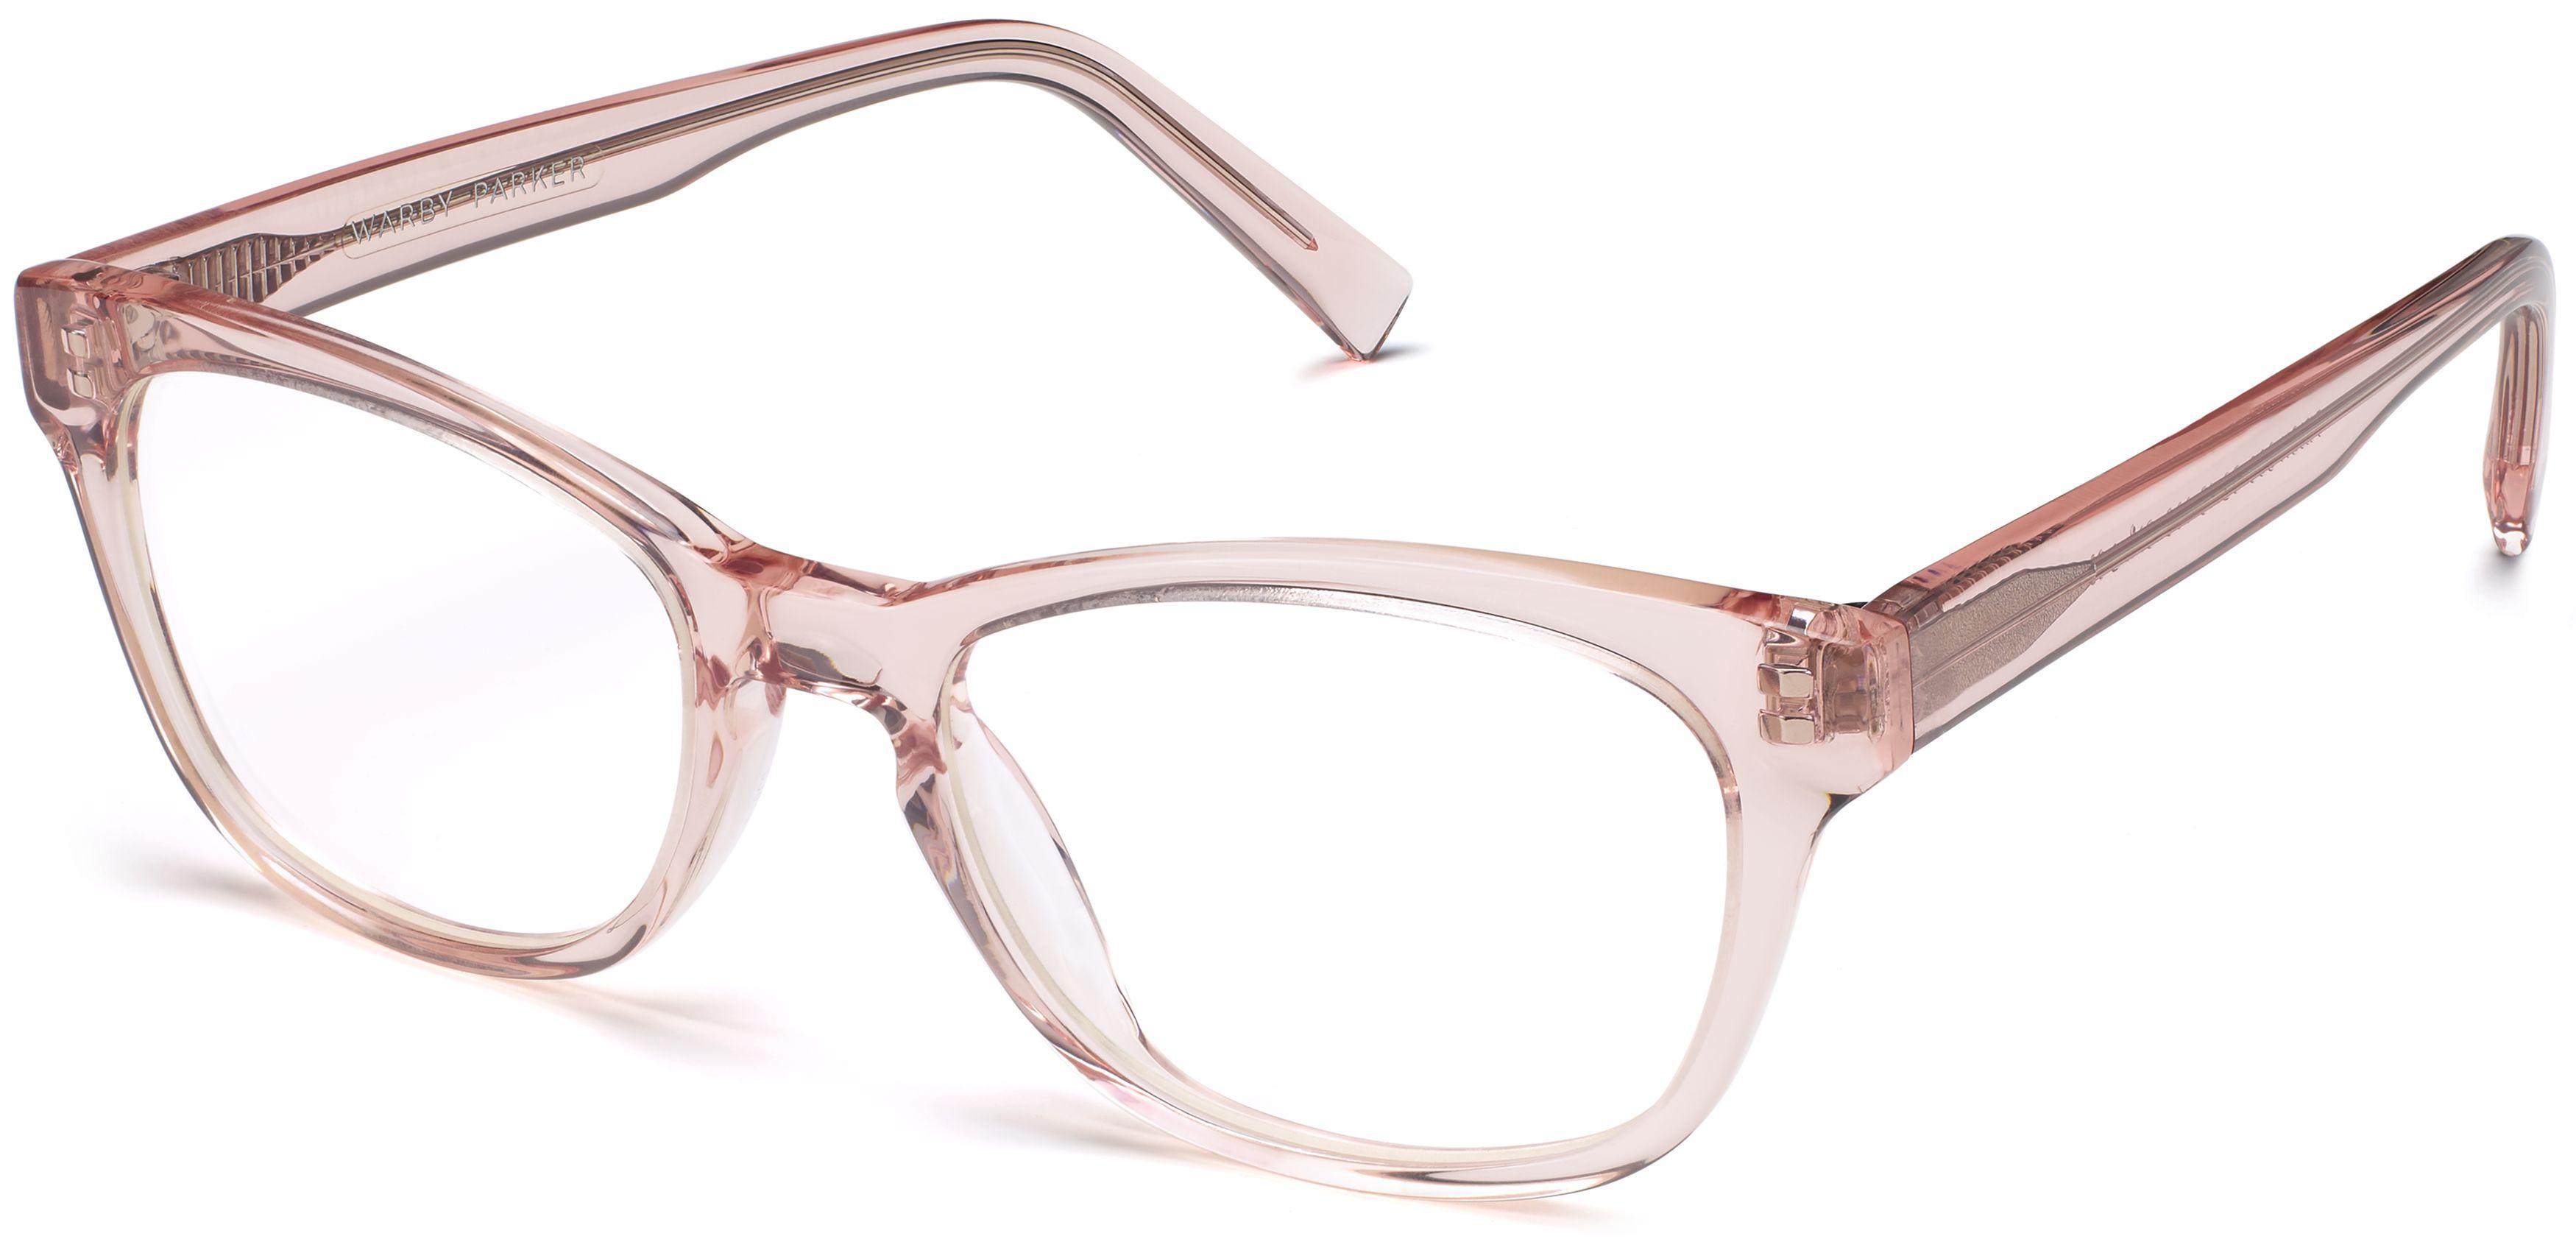 a96484b772 Finch Eyeglasses in Rose Crystal for Women